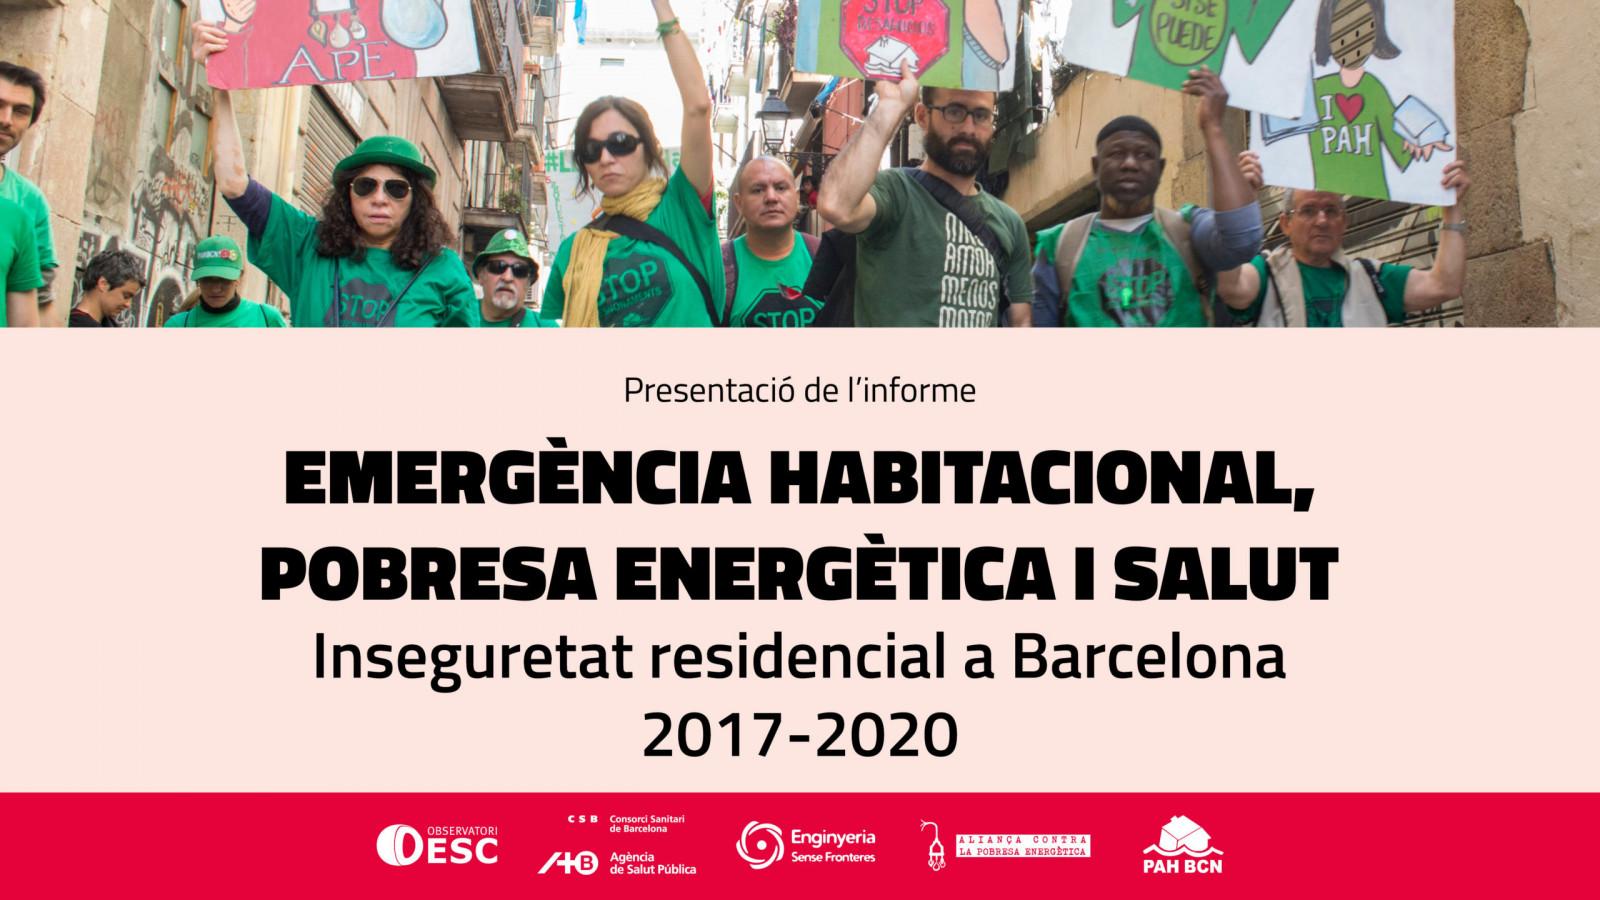 presentacio-informe-emergencia-habitacional-pobresa-energetica-i-salut-scaled.jpg